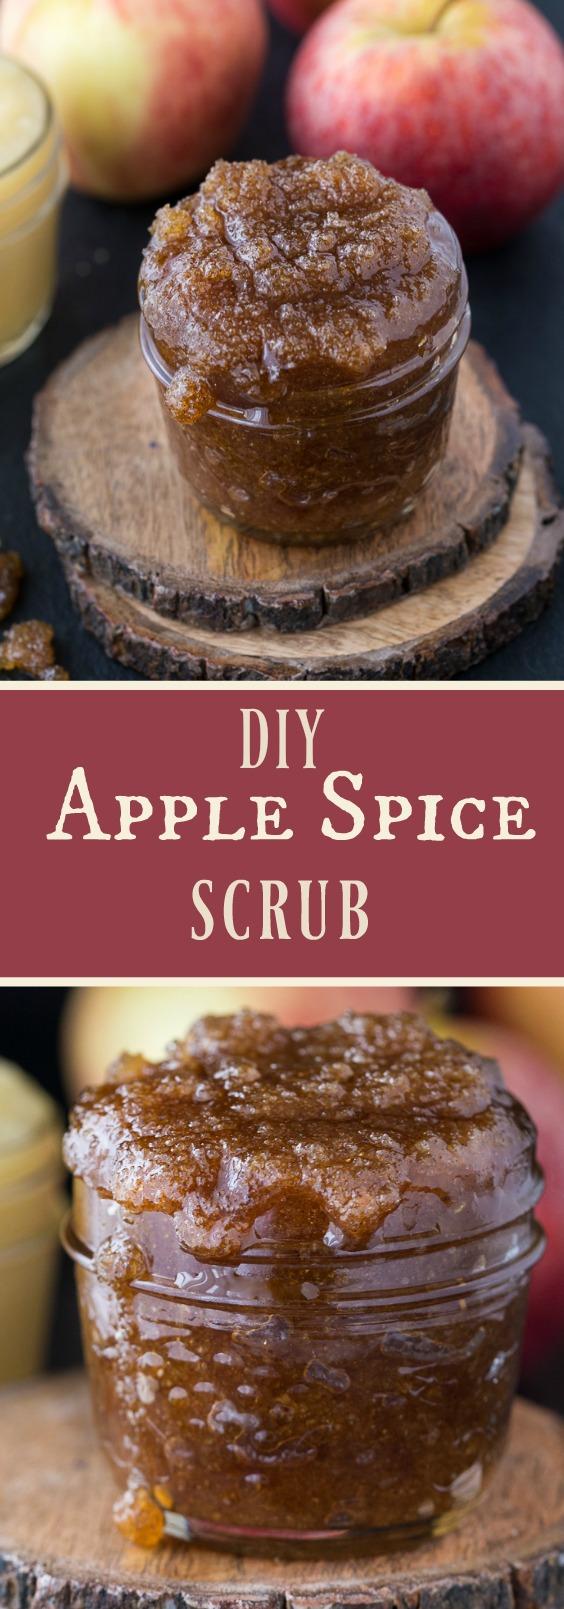 diy-apple-spice-scrub-beauty-collage